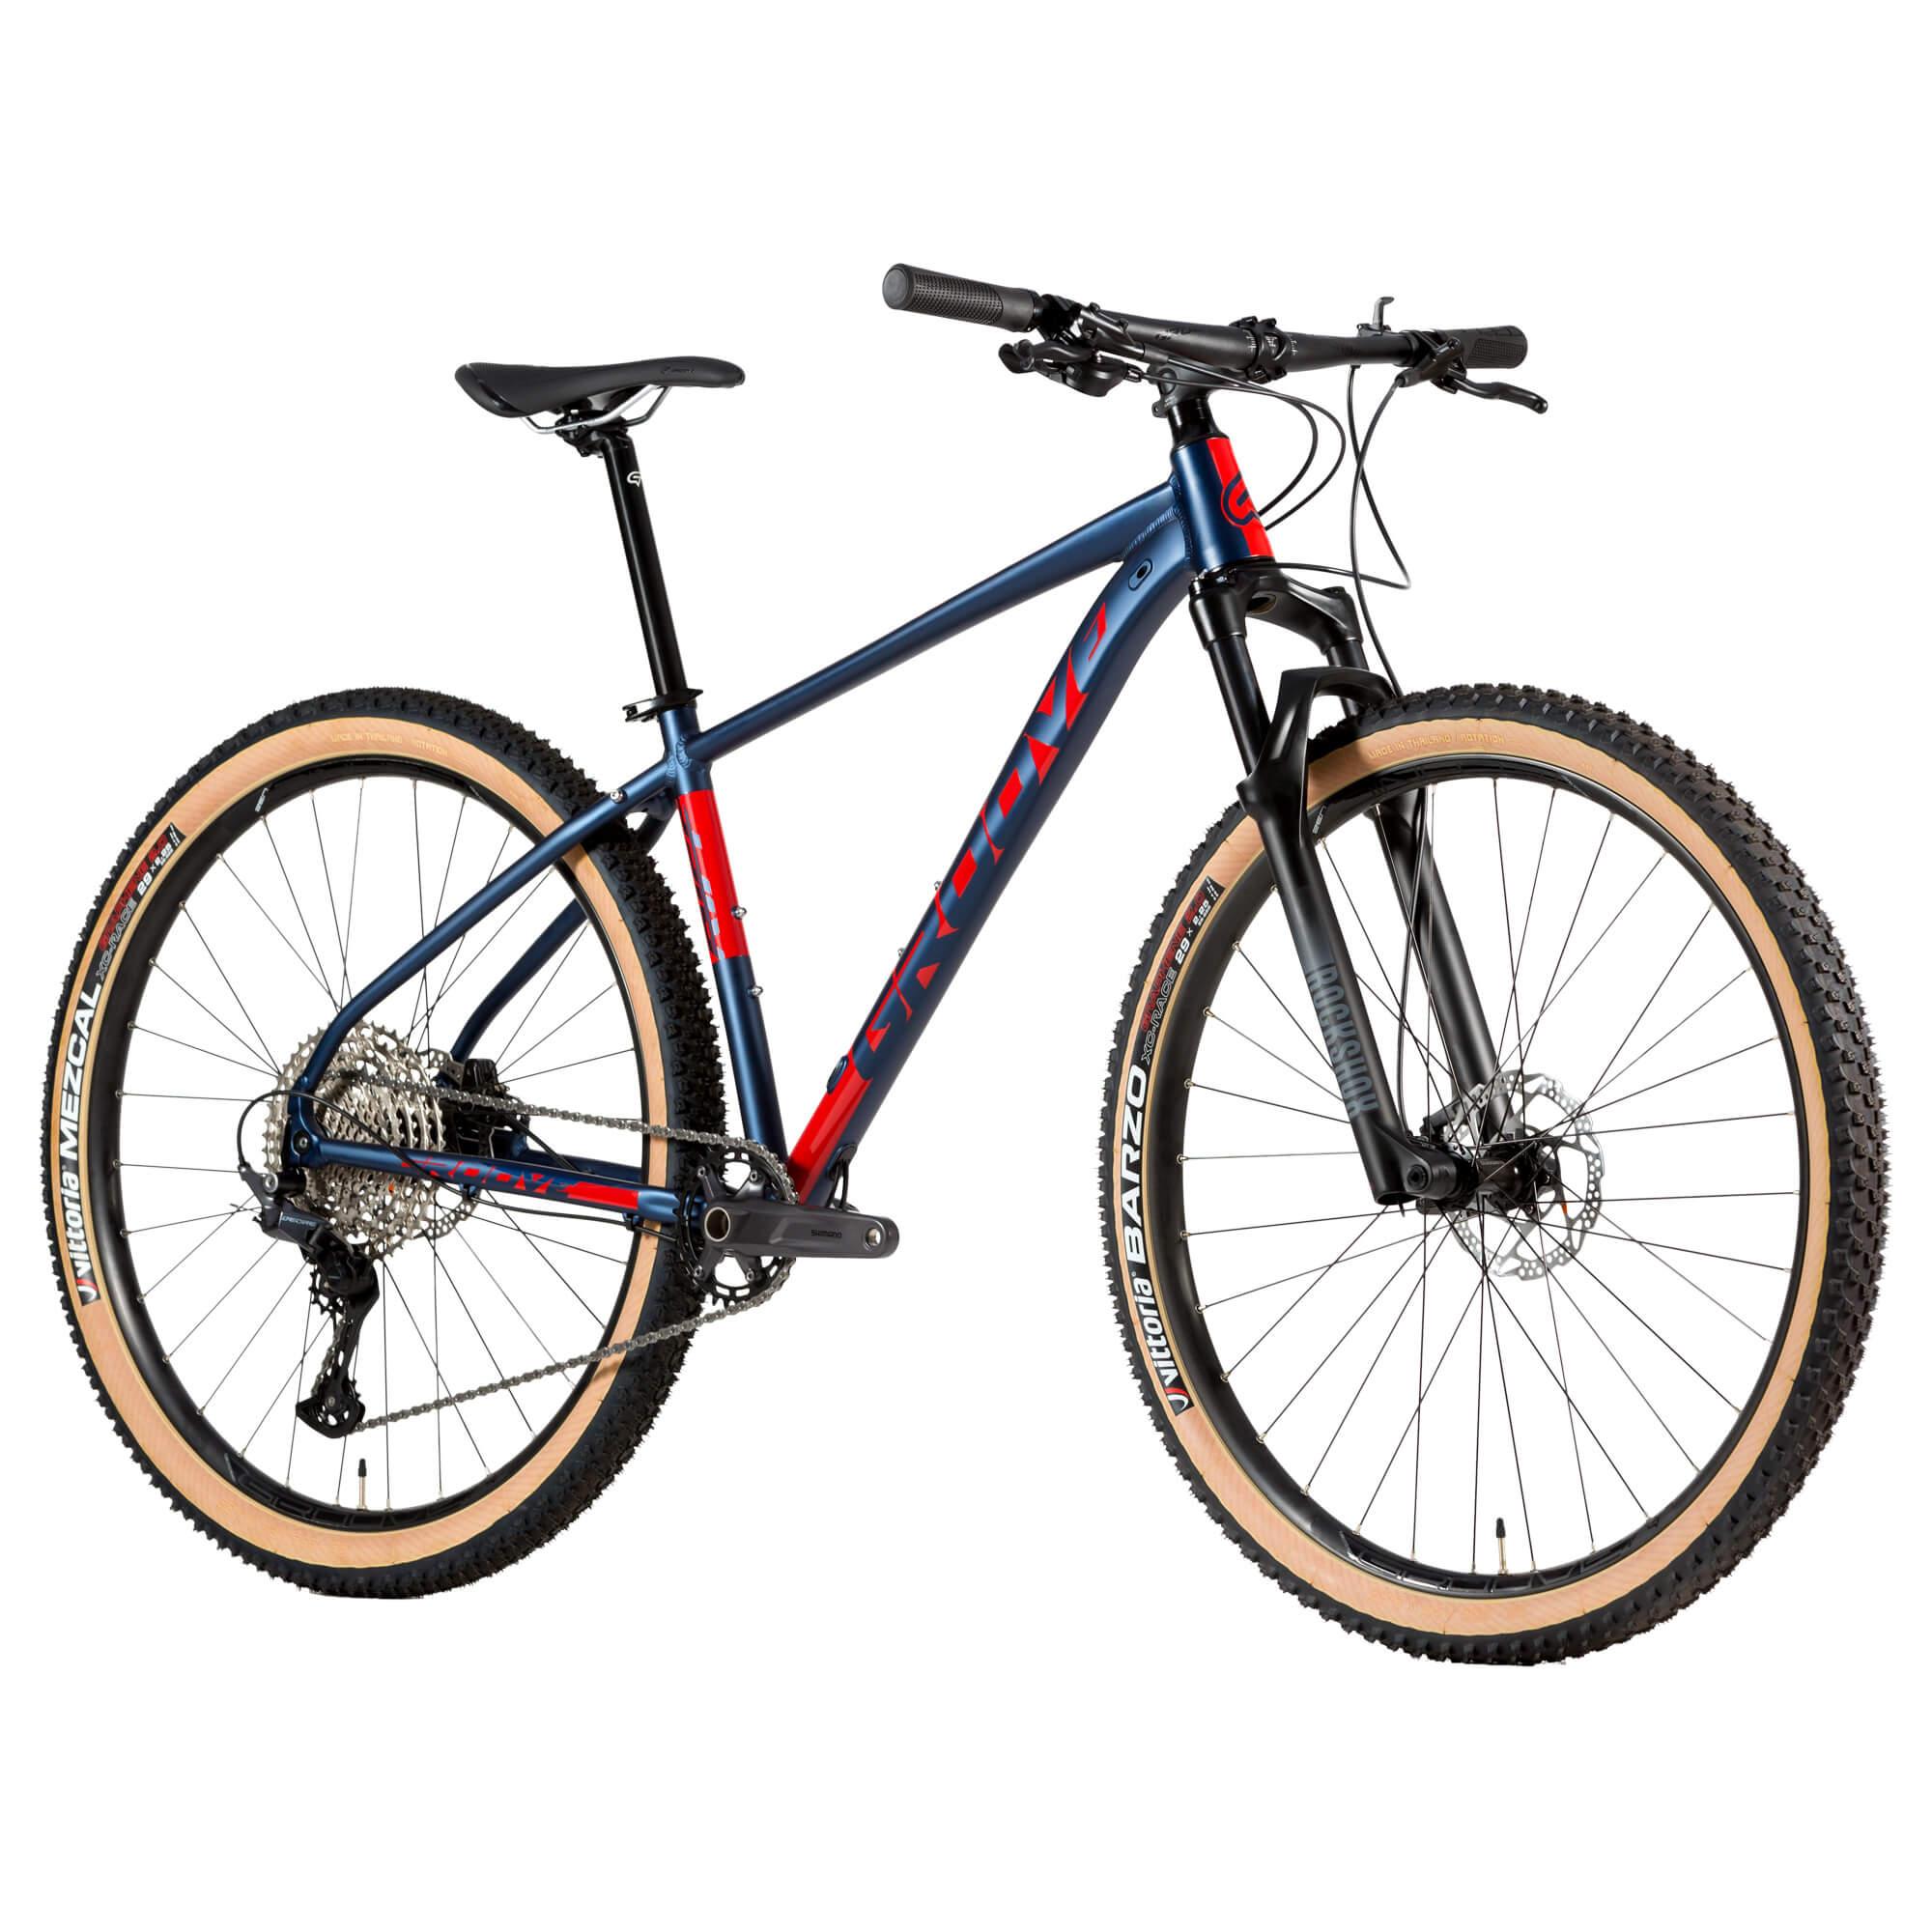 Bicicleta Groove Riff 70 Aro 29 2021 Shimano Deore 12V